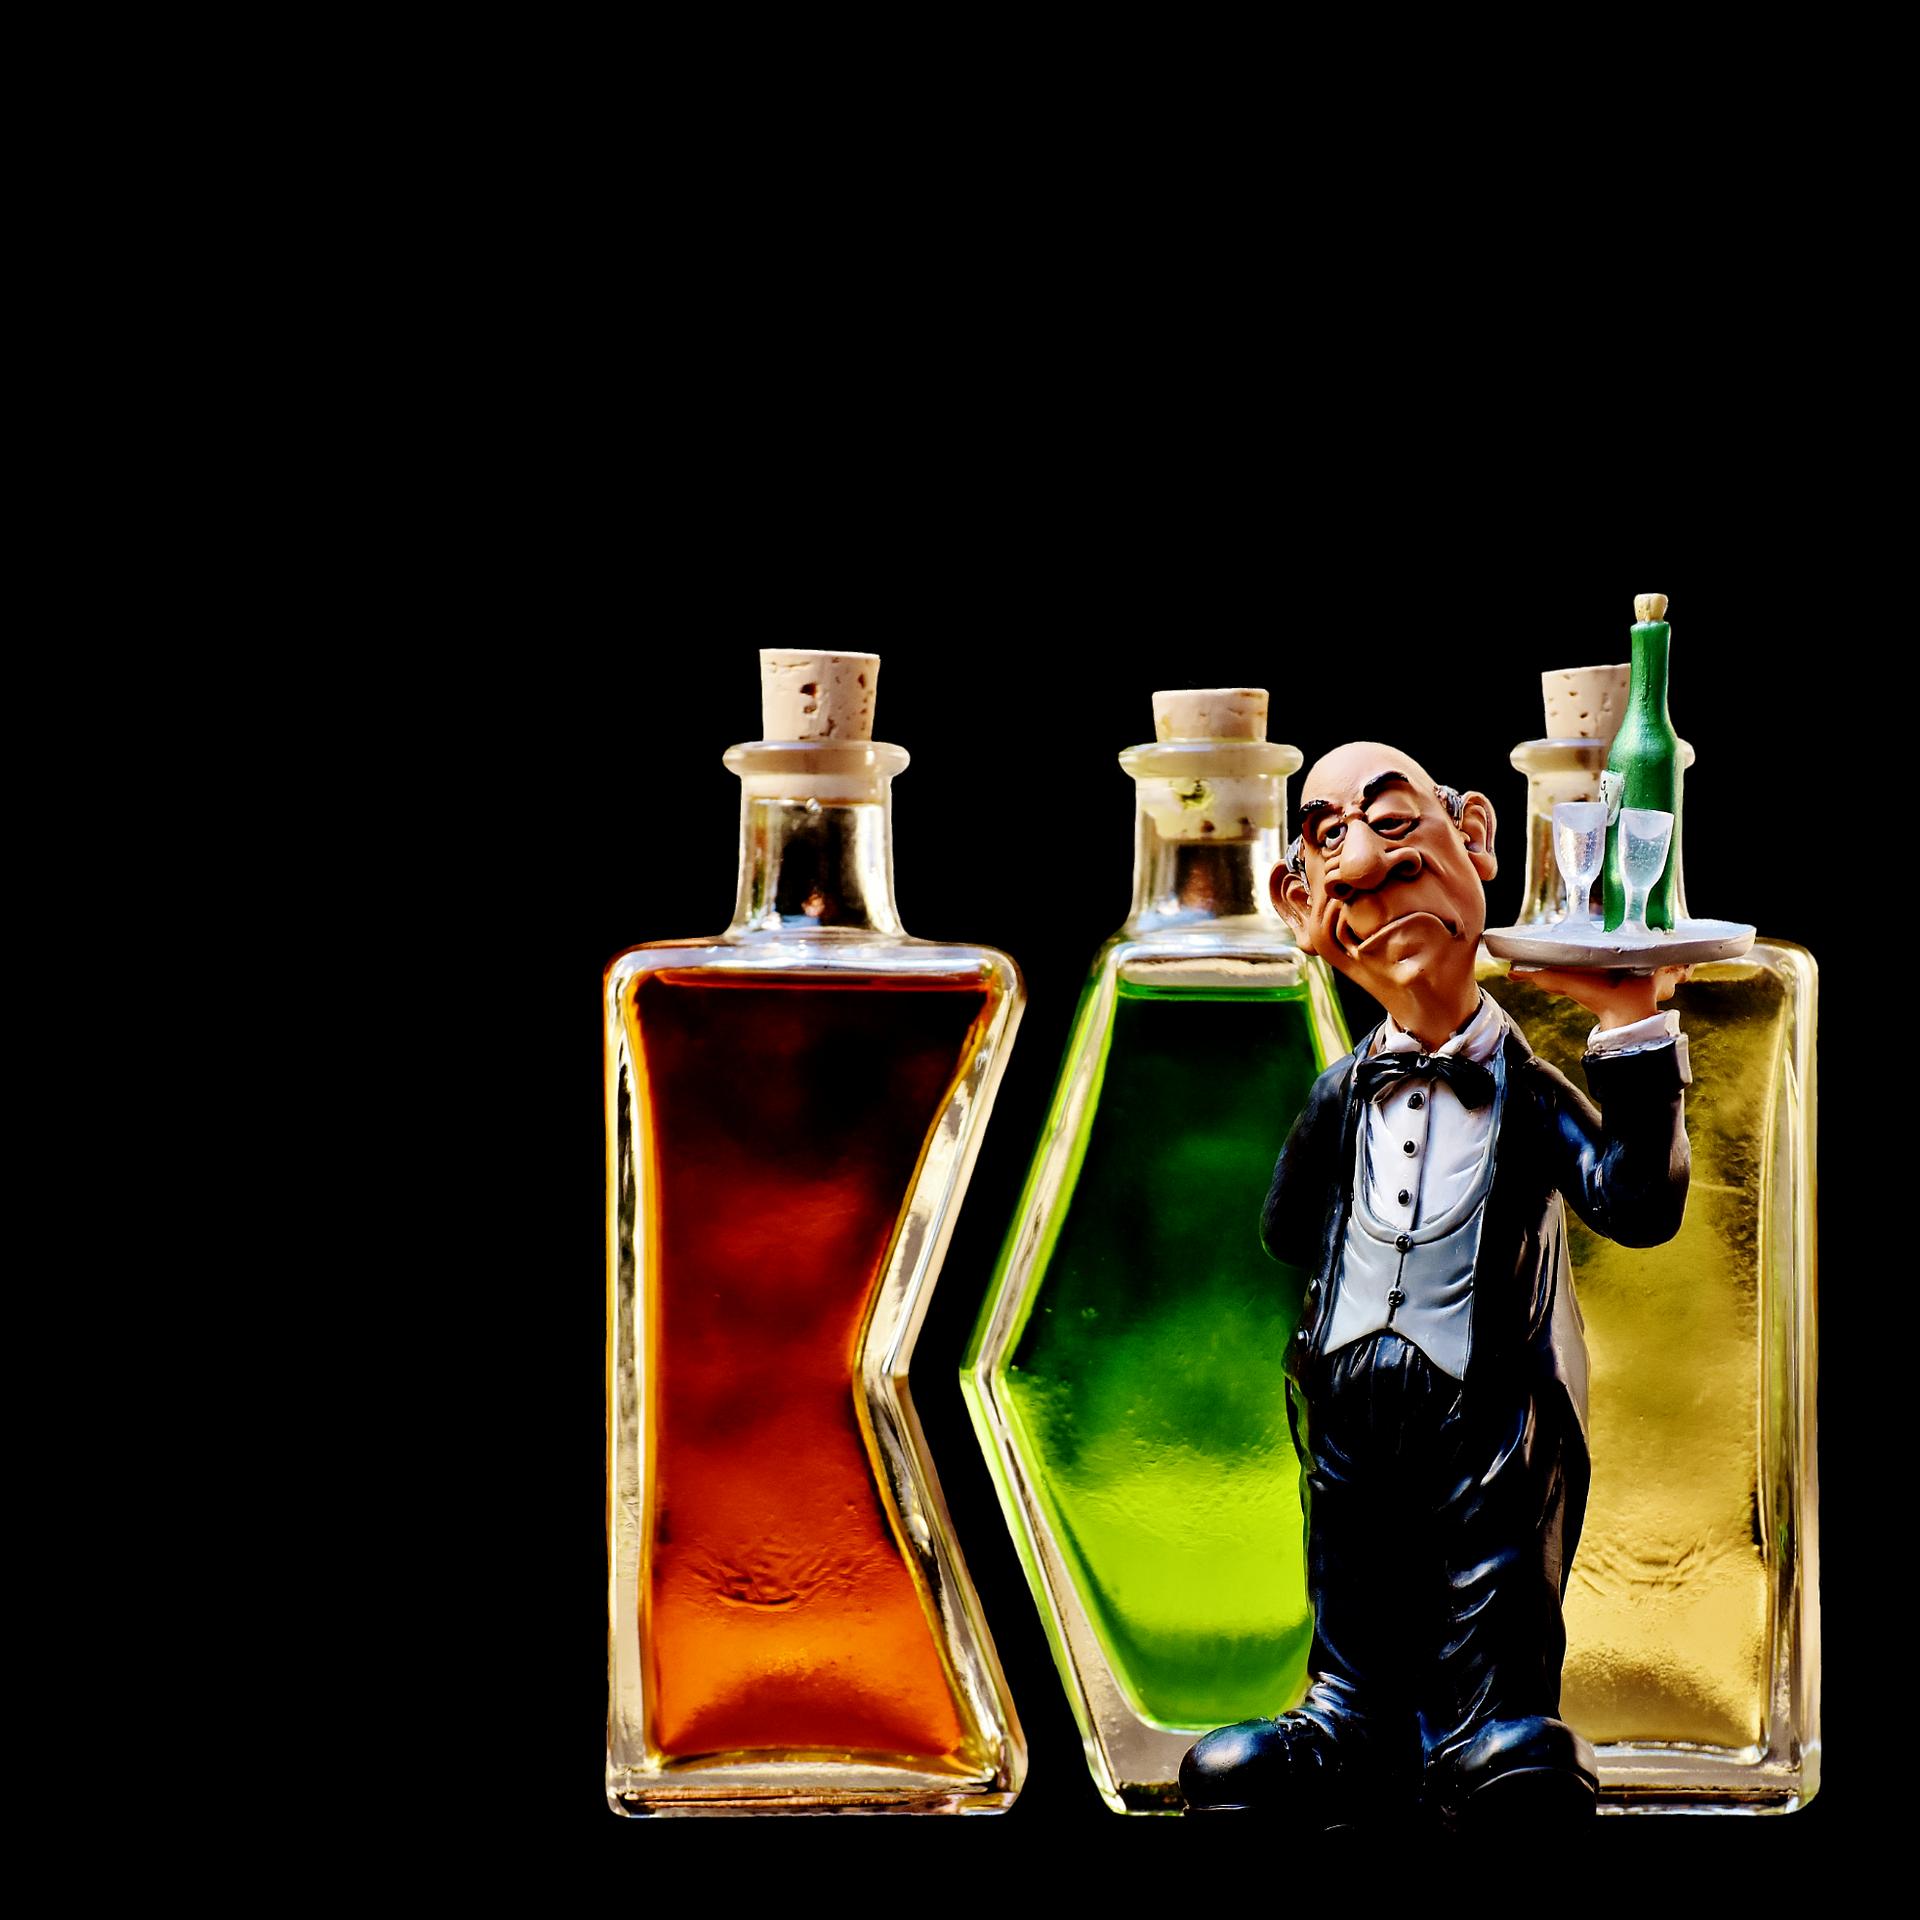 Фото открытки с бутылкой